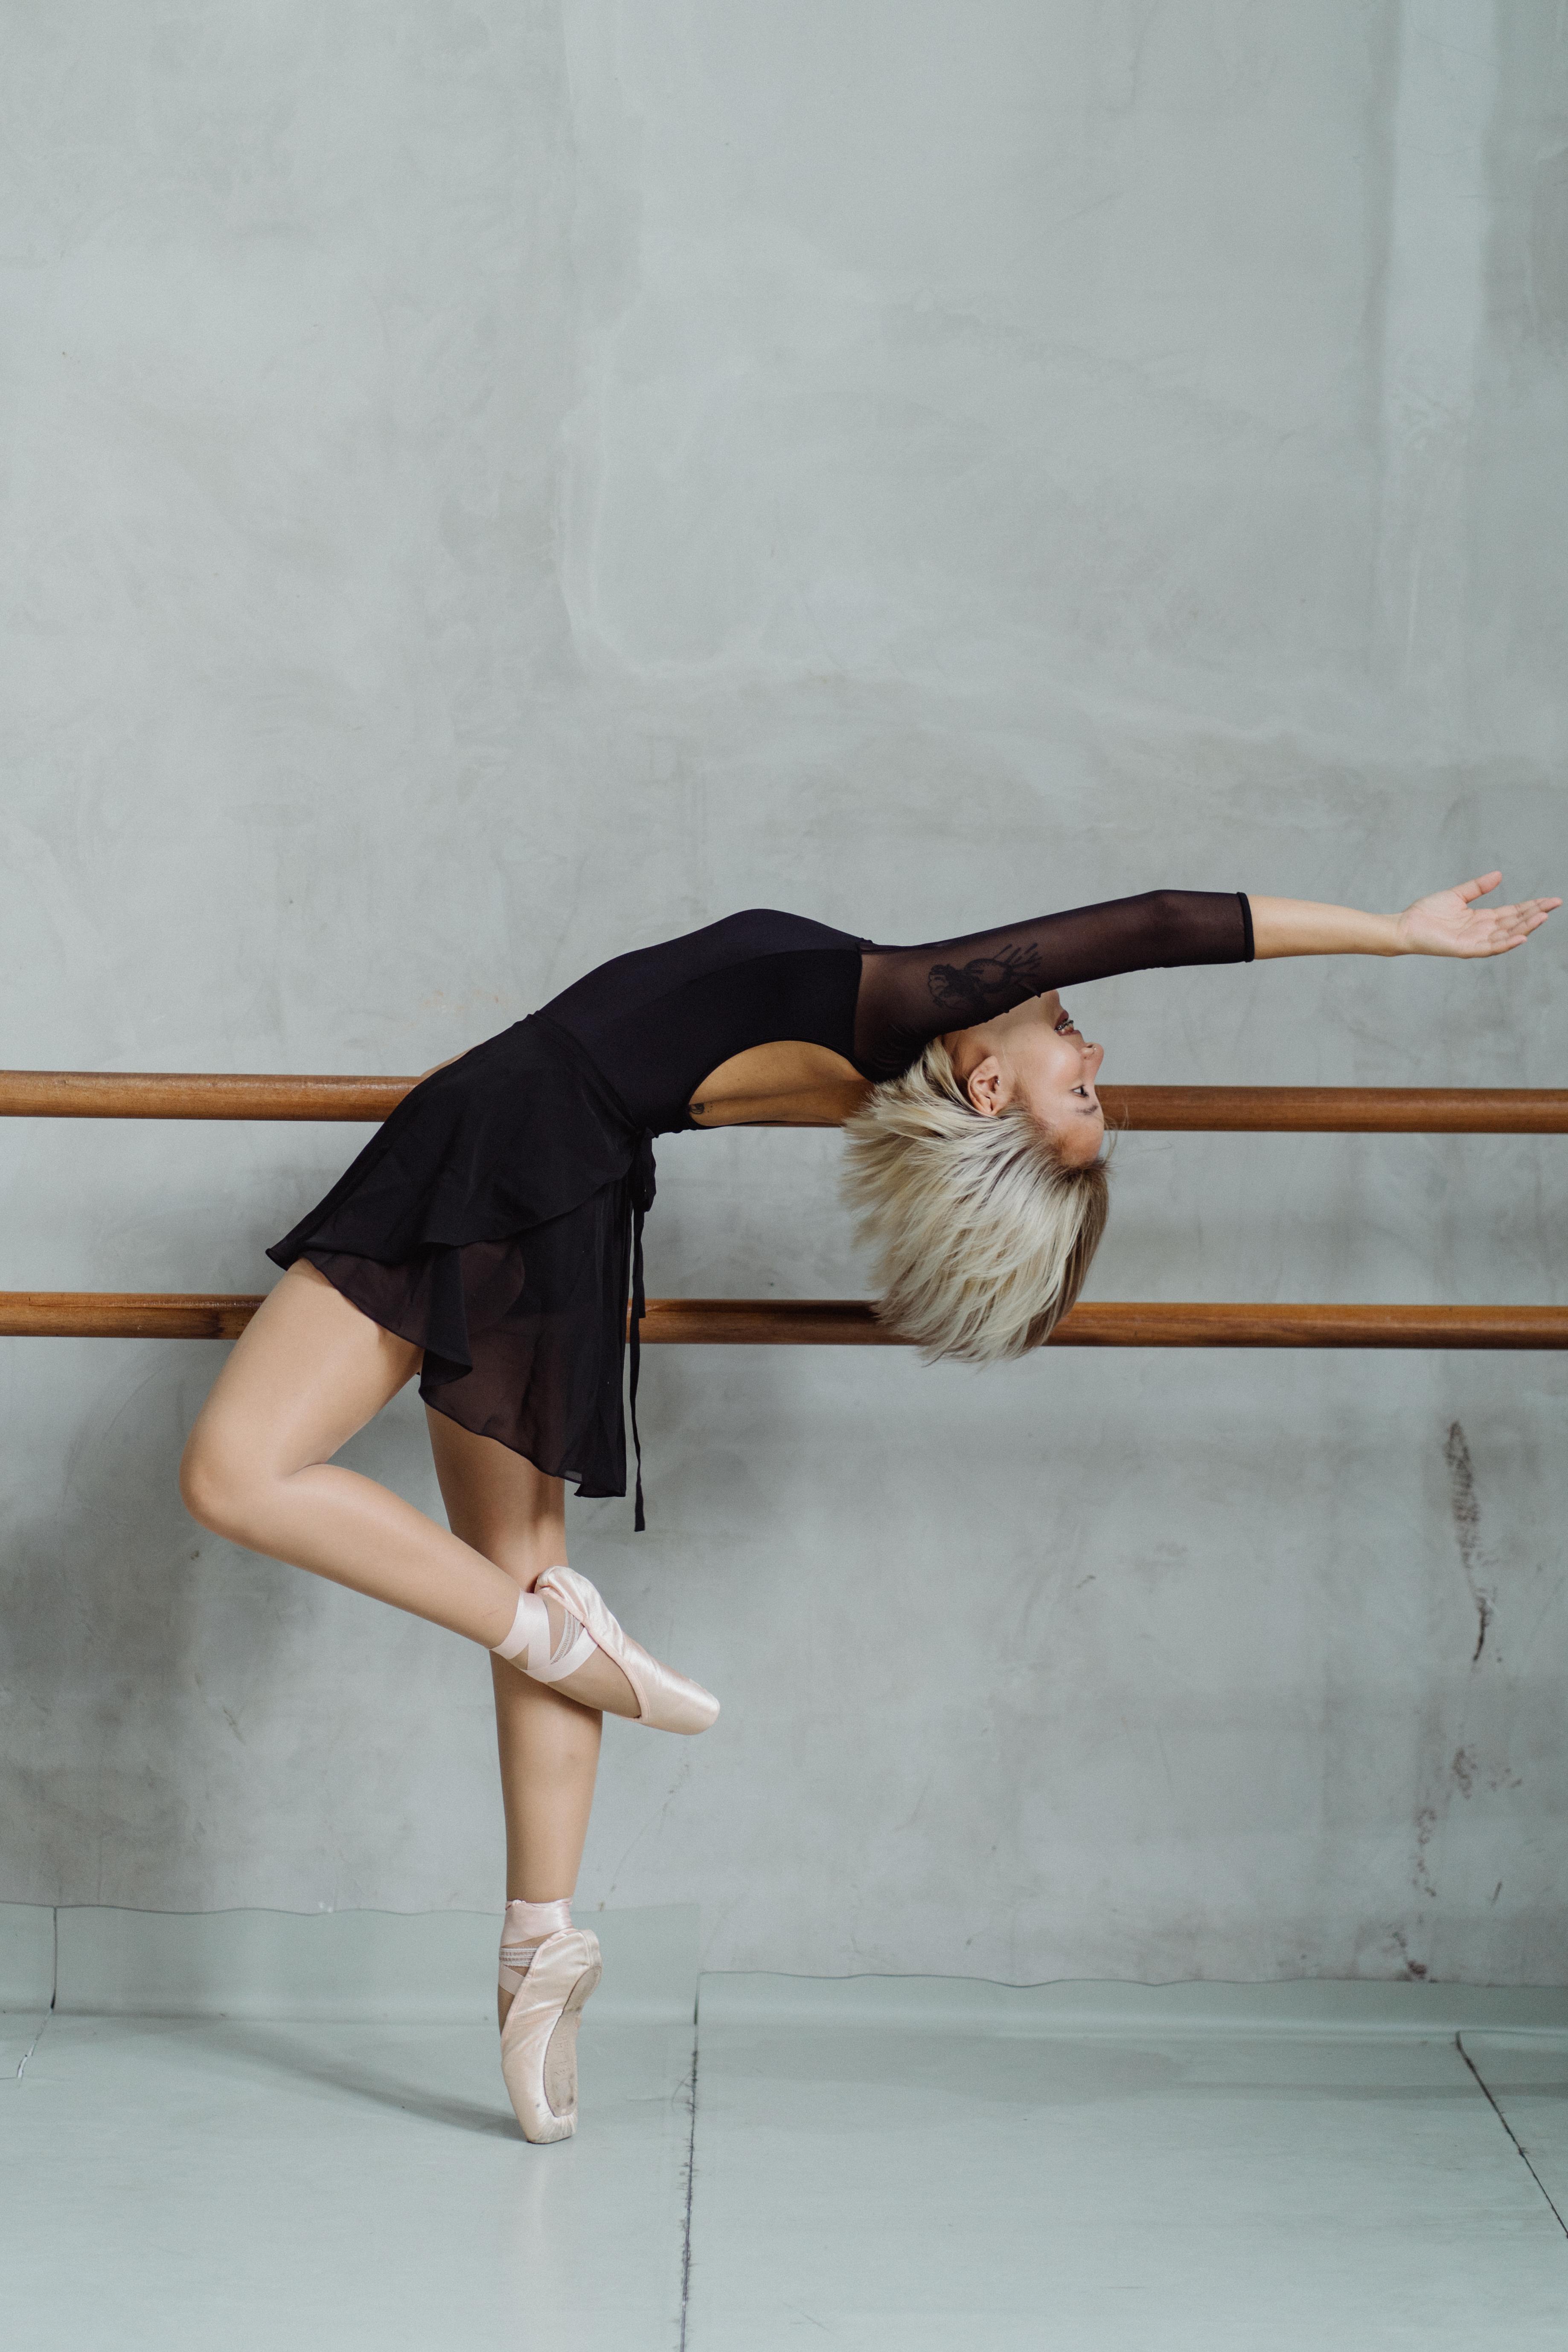 photo of ballet dancer doing warm ups